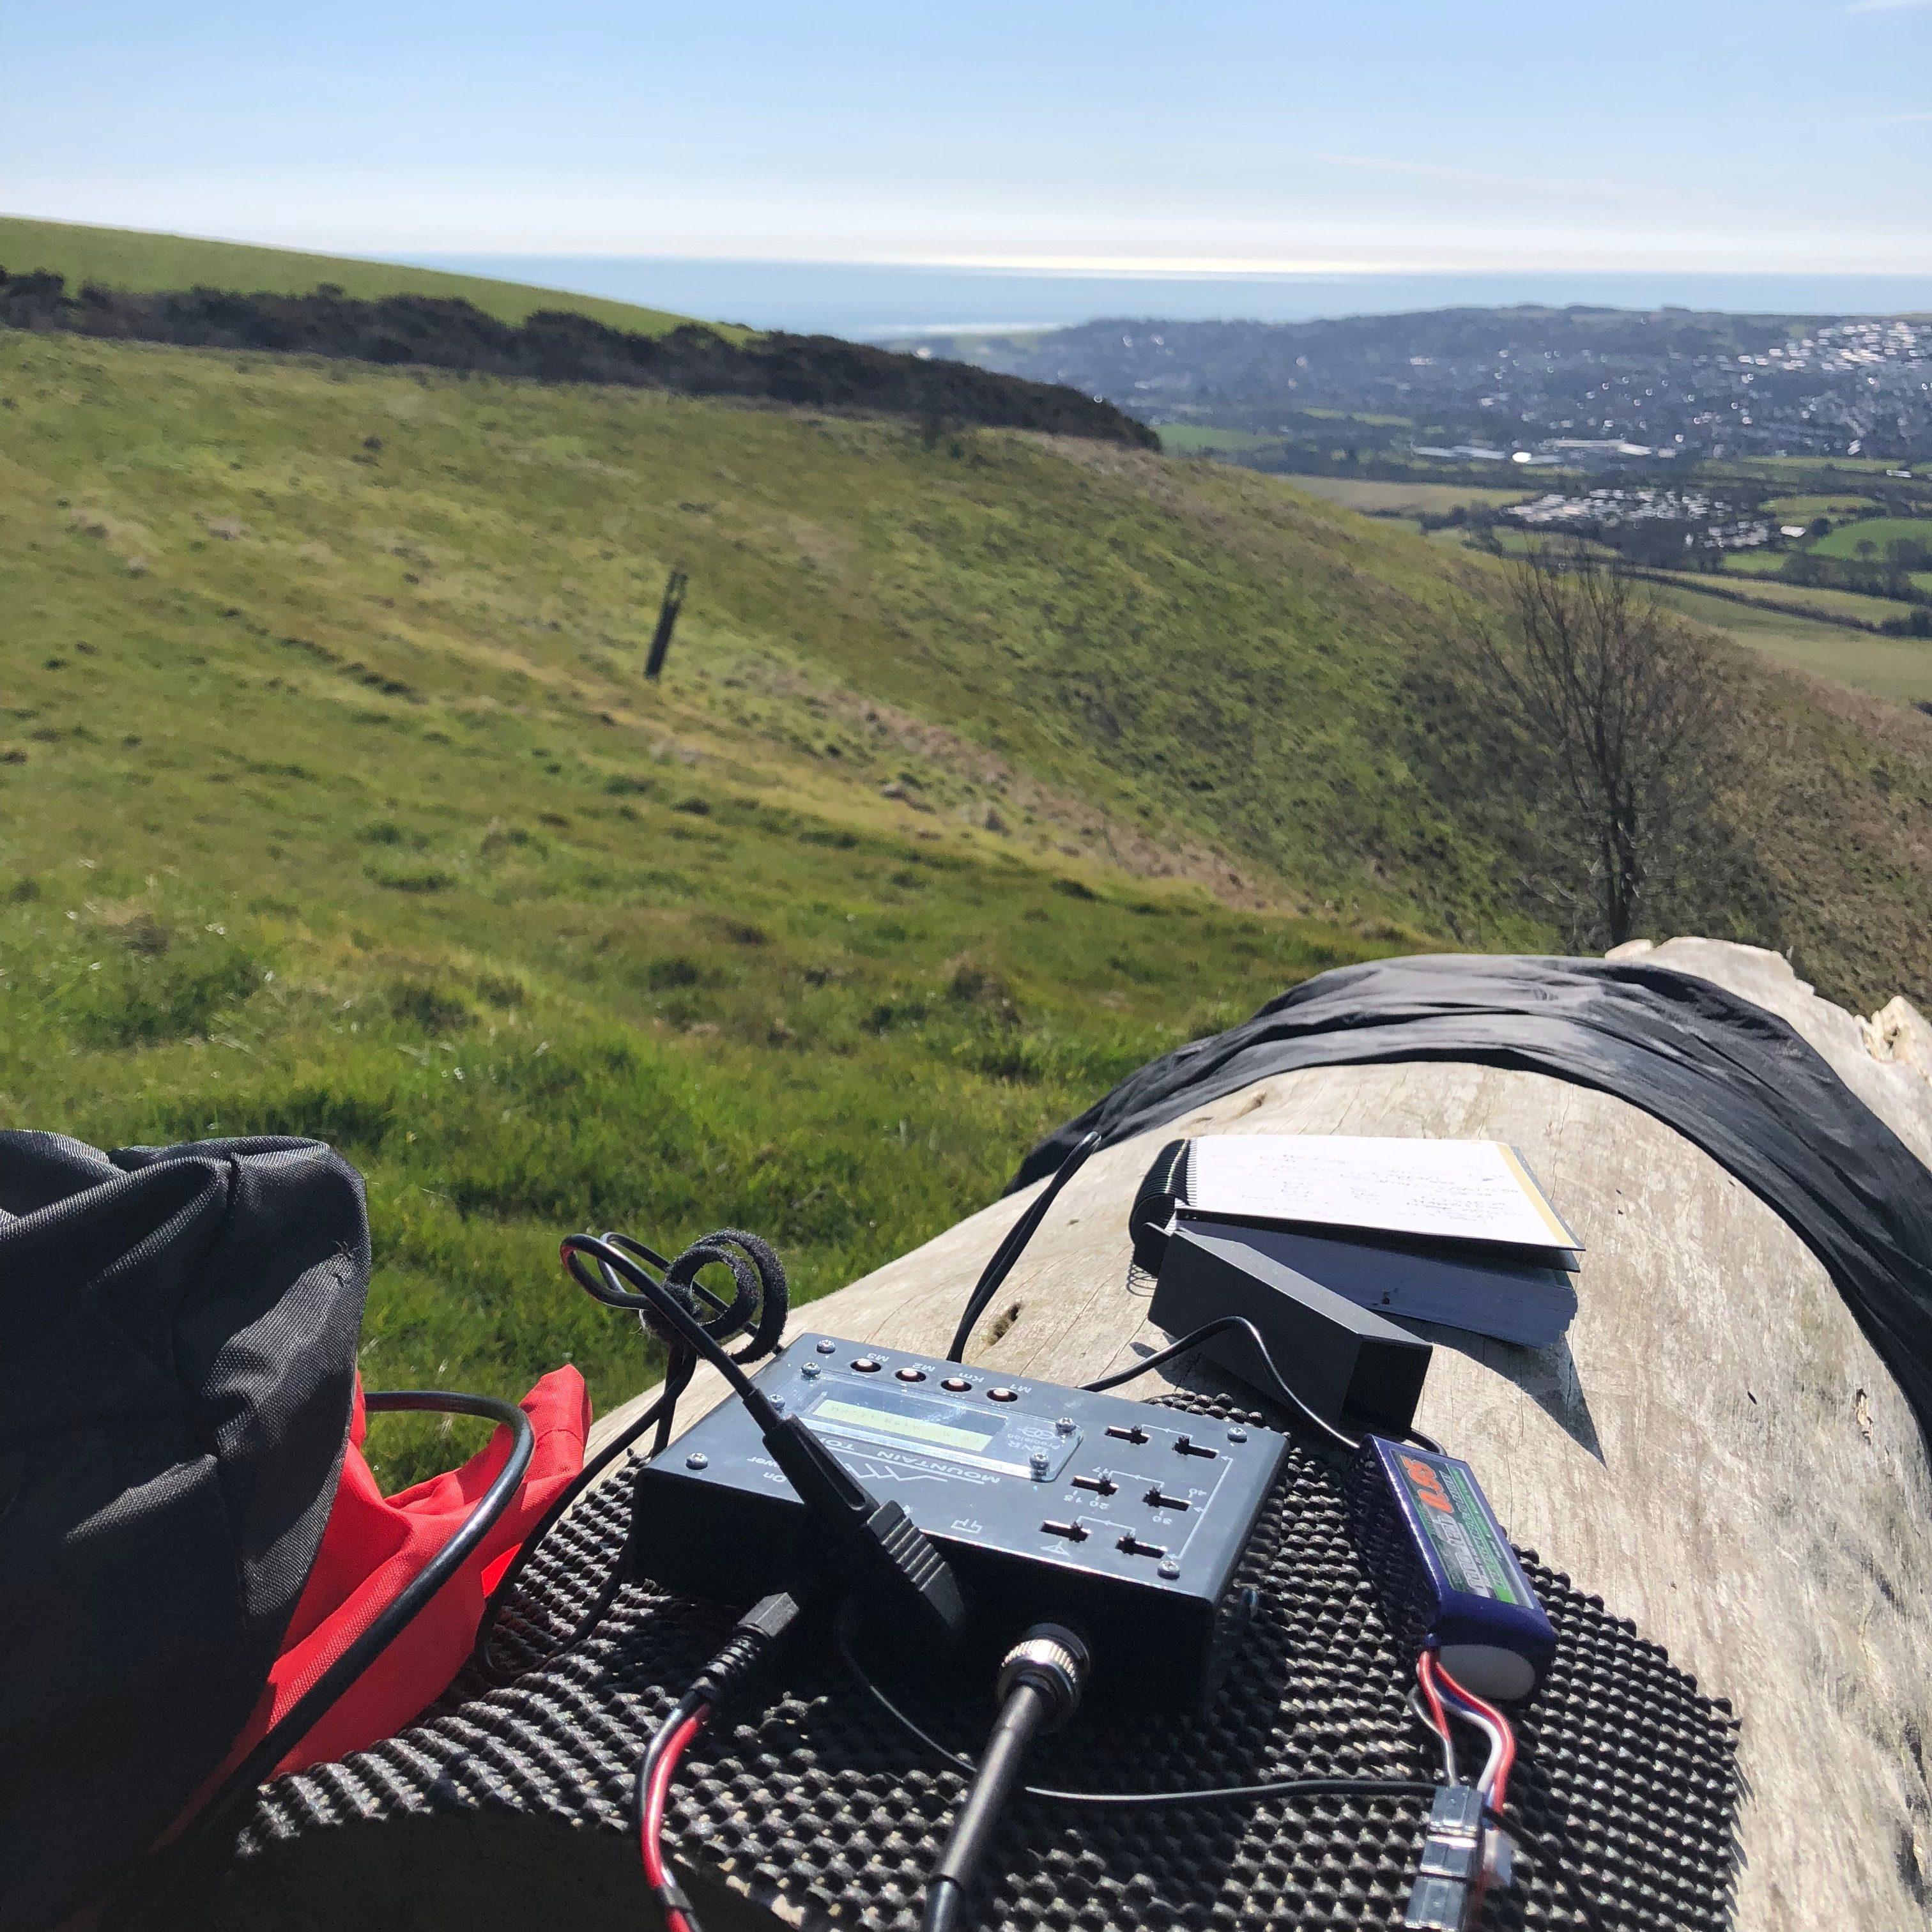 Radio log, my operating position